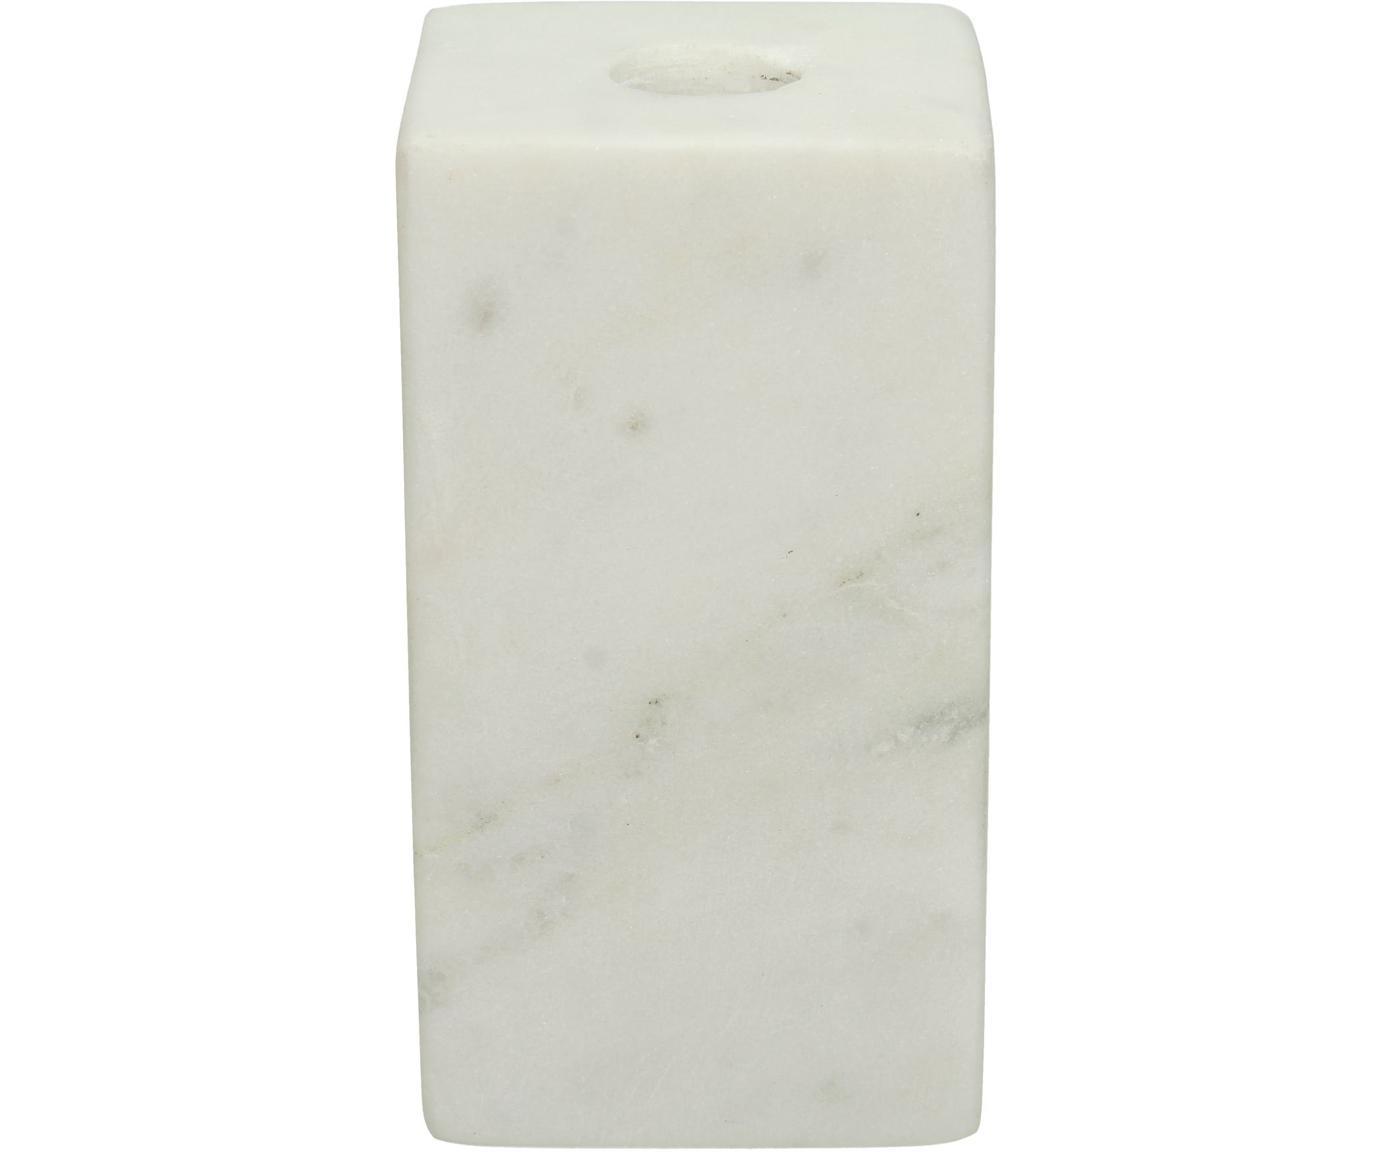 Portacandela in marmo Marble, Marmo, Bianco, Larg. 6 x Alt. 11 cm